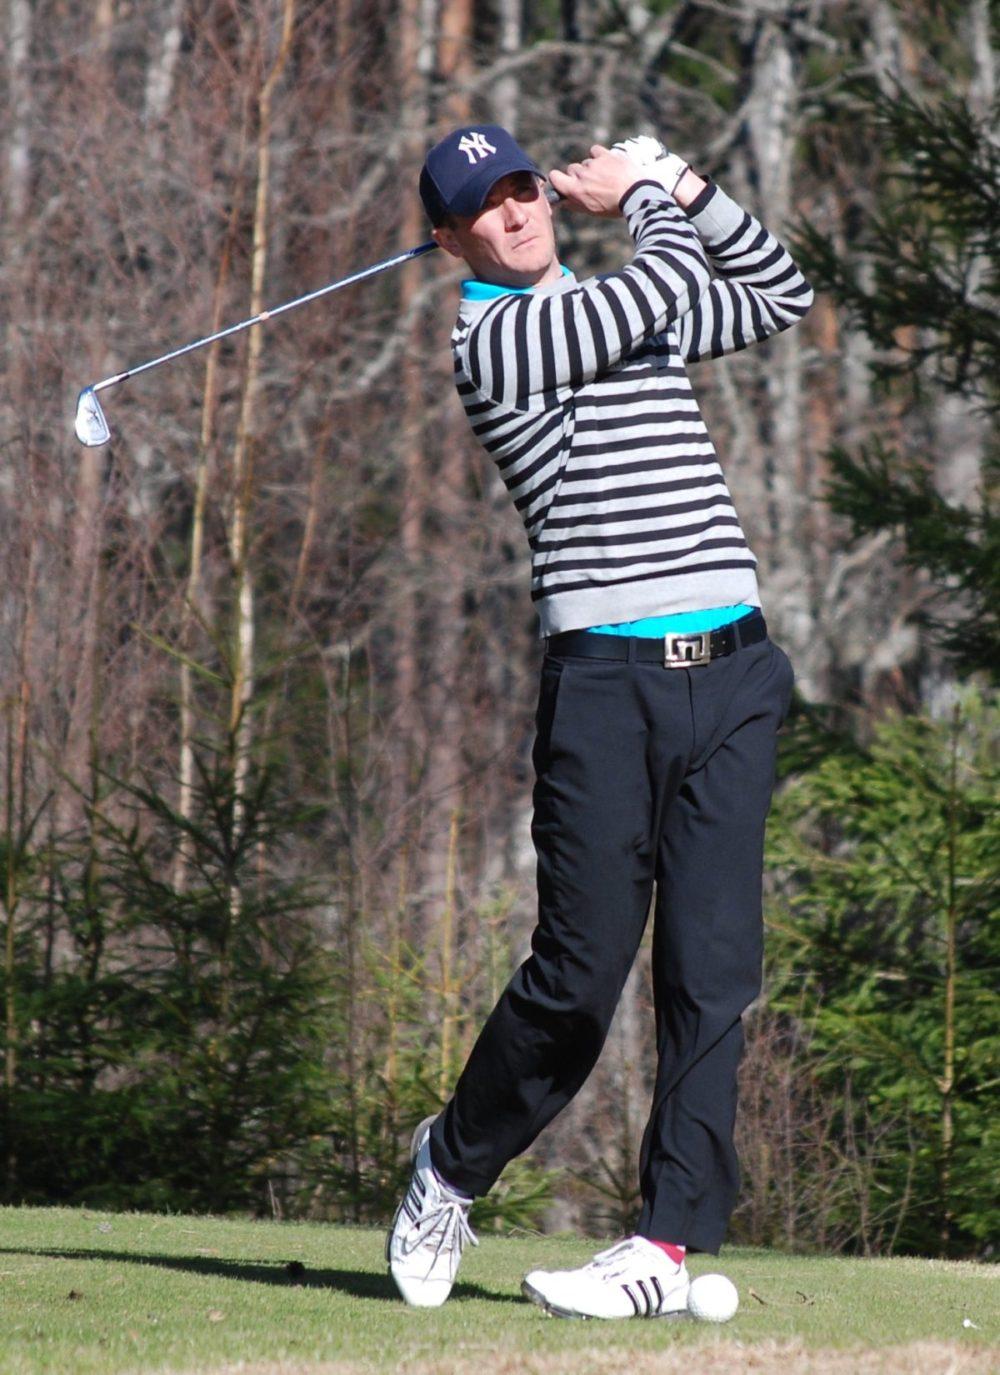 henrik engvall golf